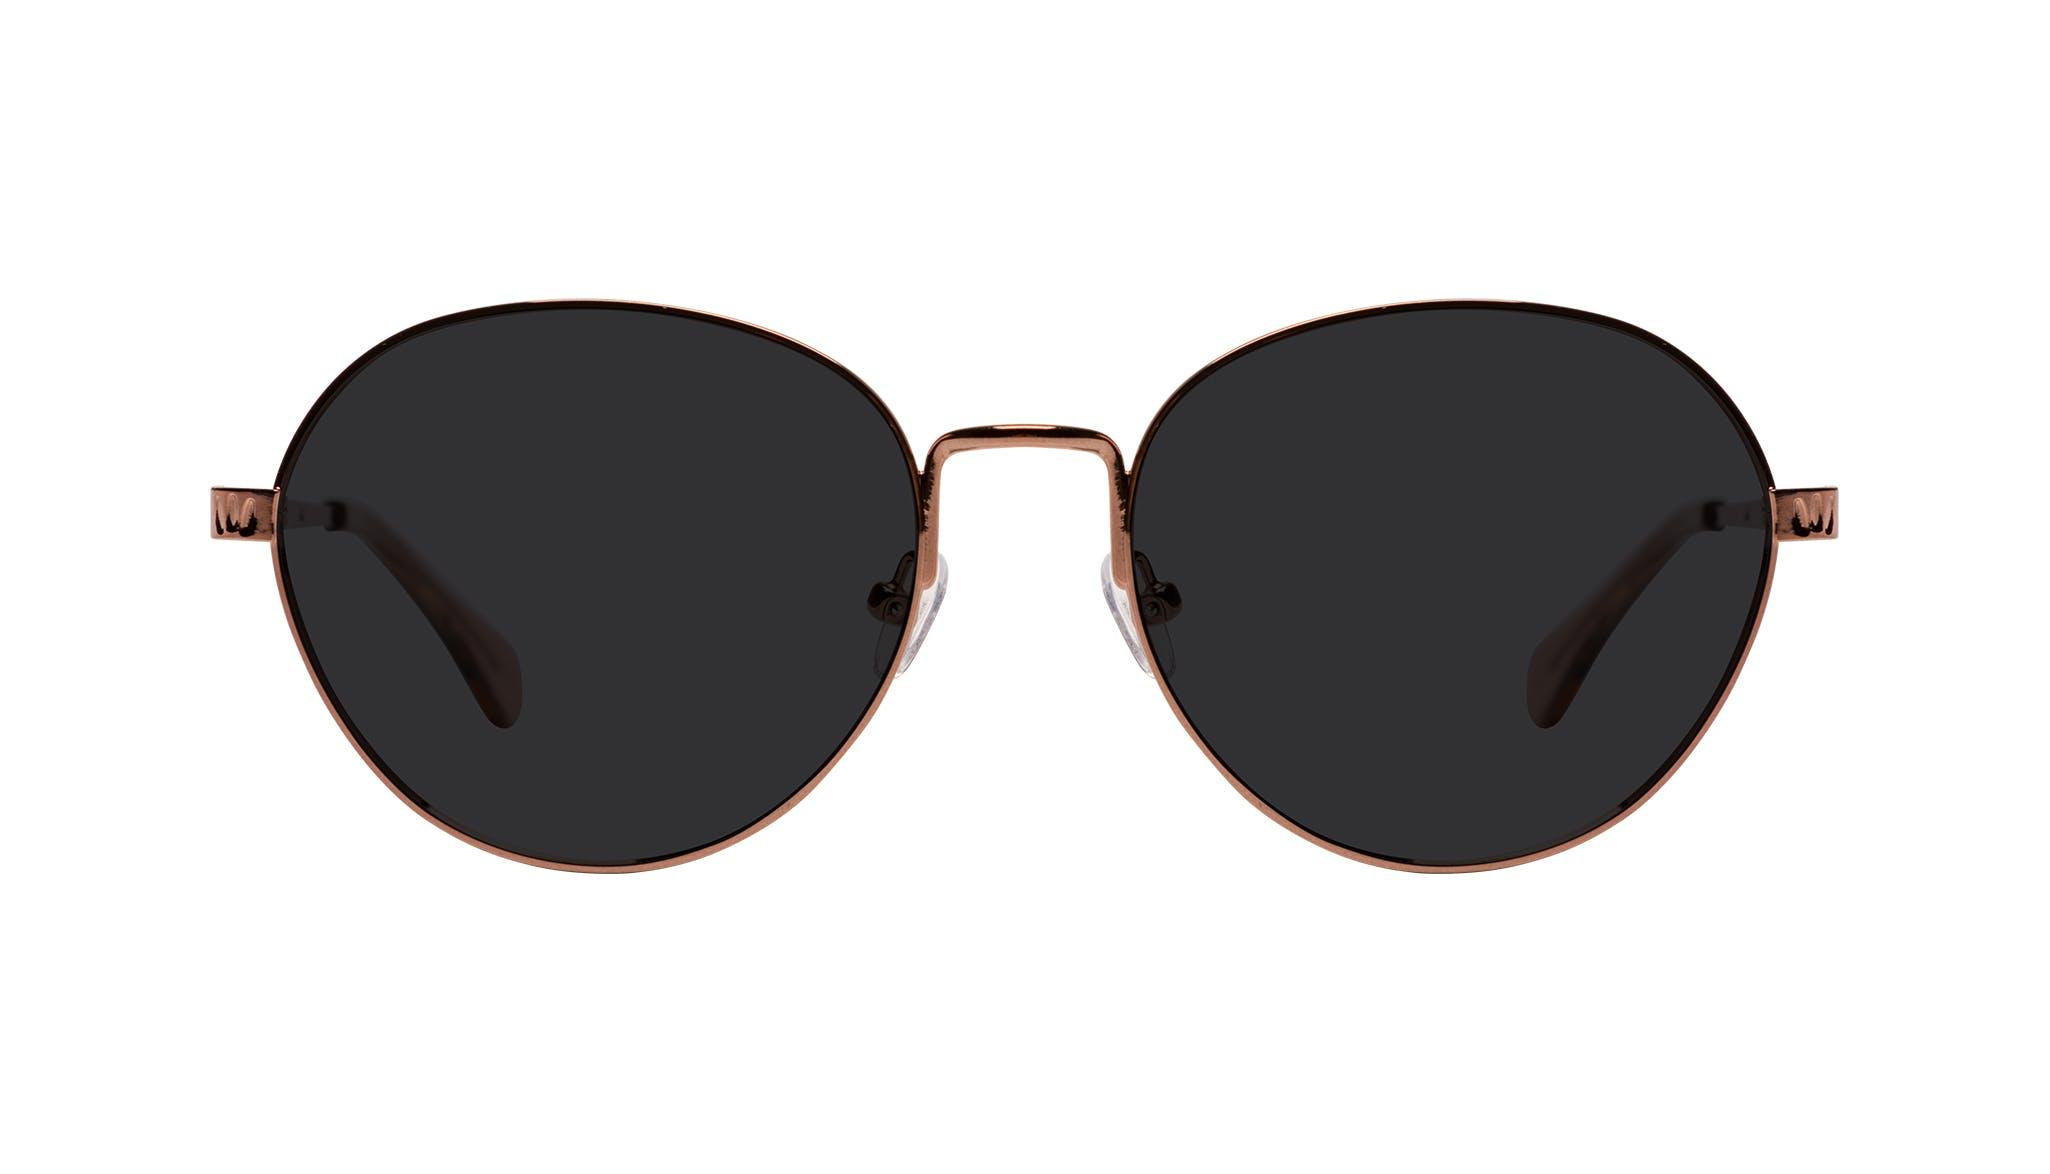 Affordable Fashion Glasses Round Sunglasses Women Brace Plus Rose Gold